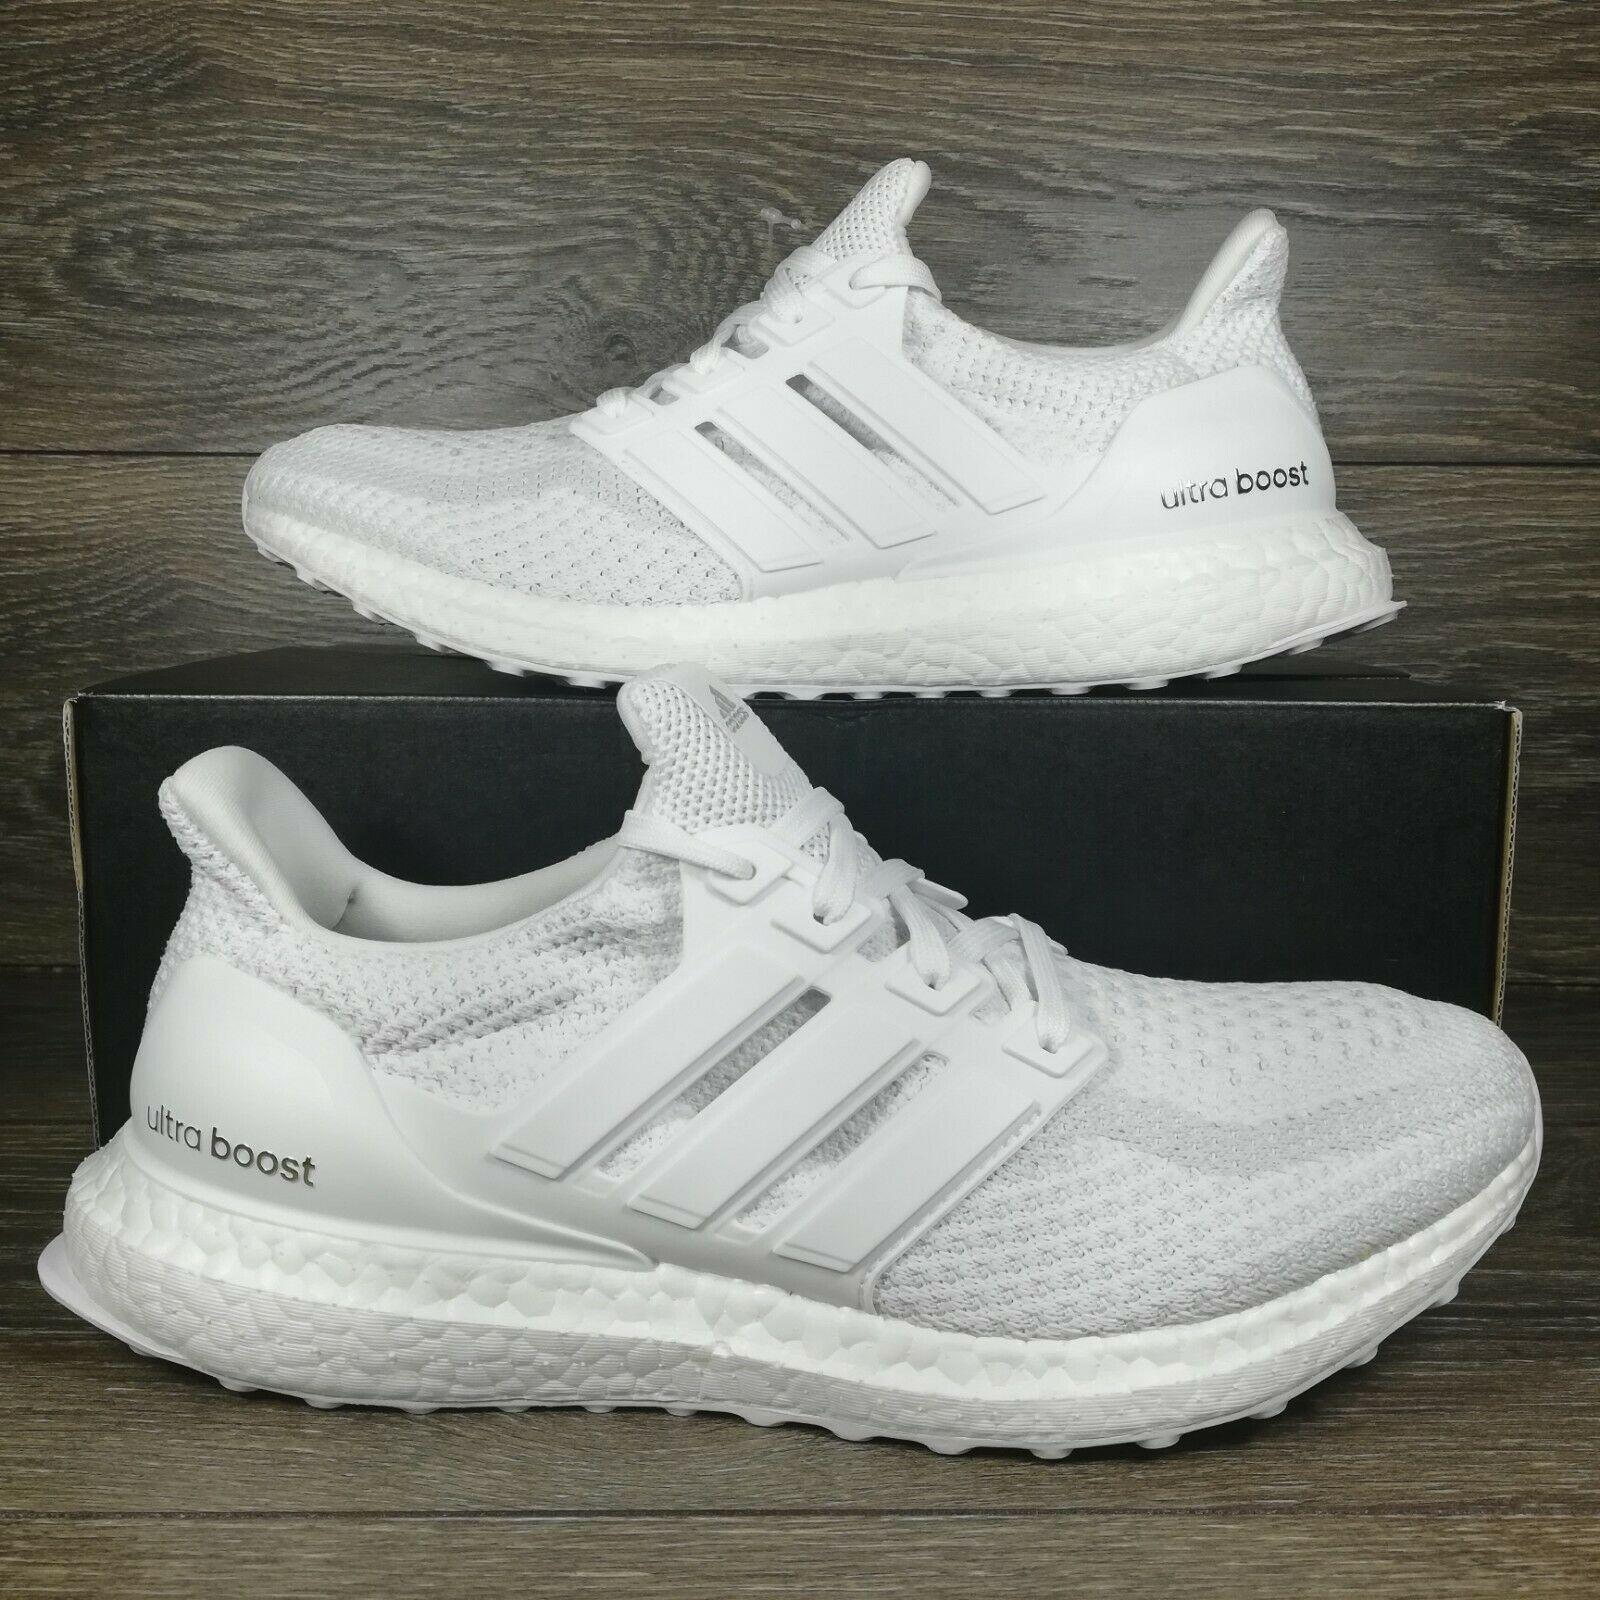 adidas Ultra Boost Triple White 2.0